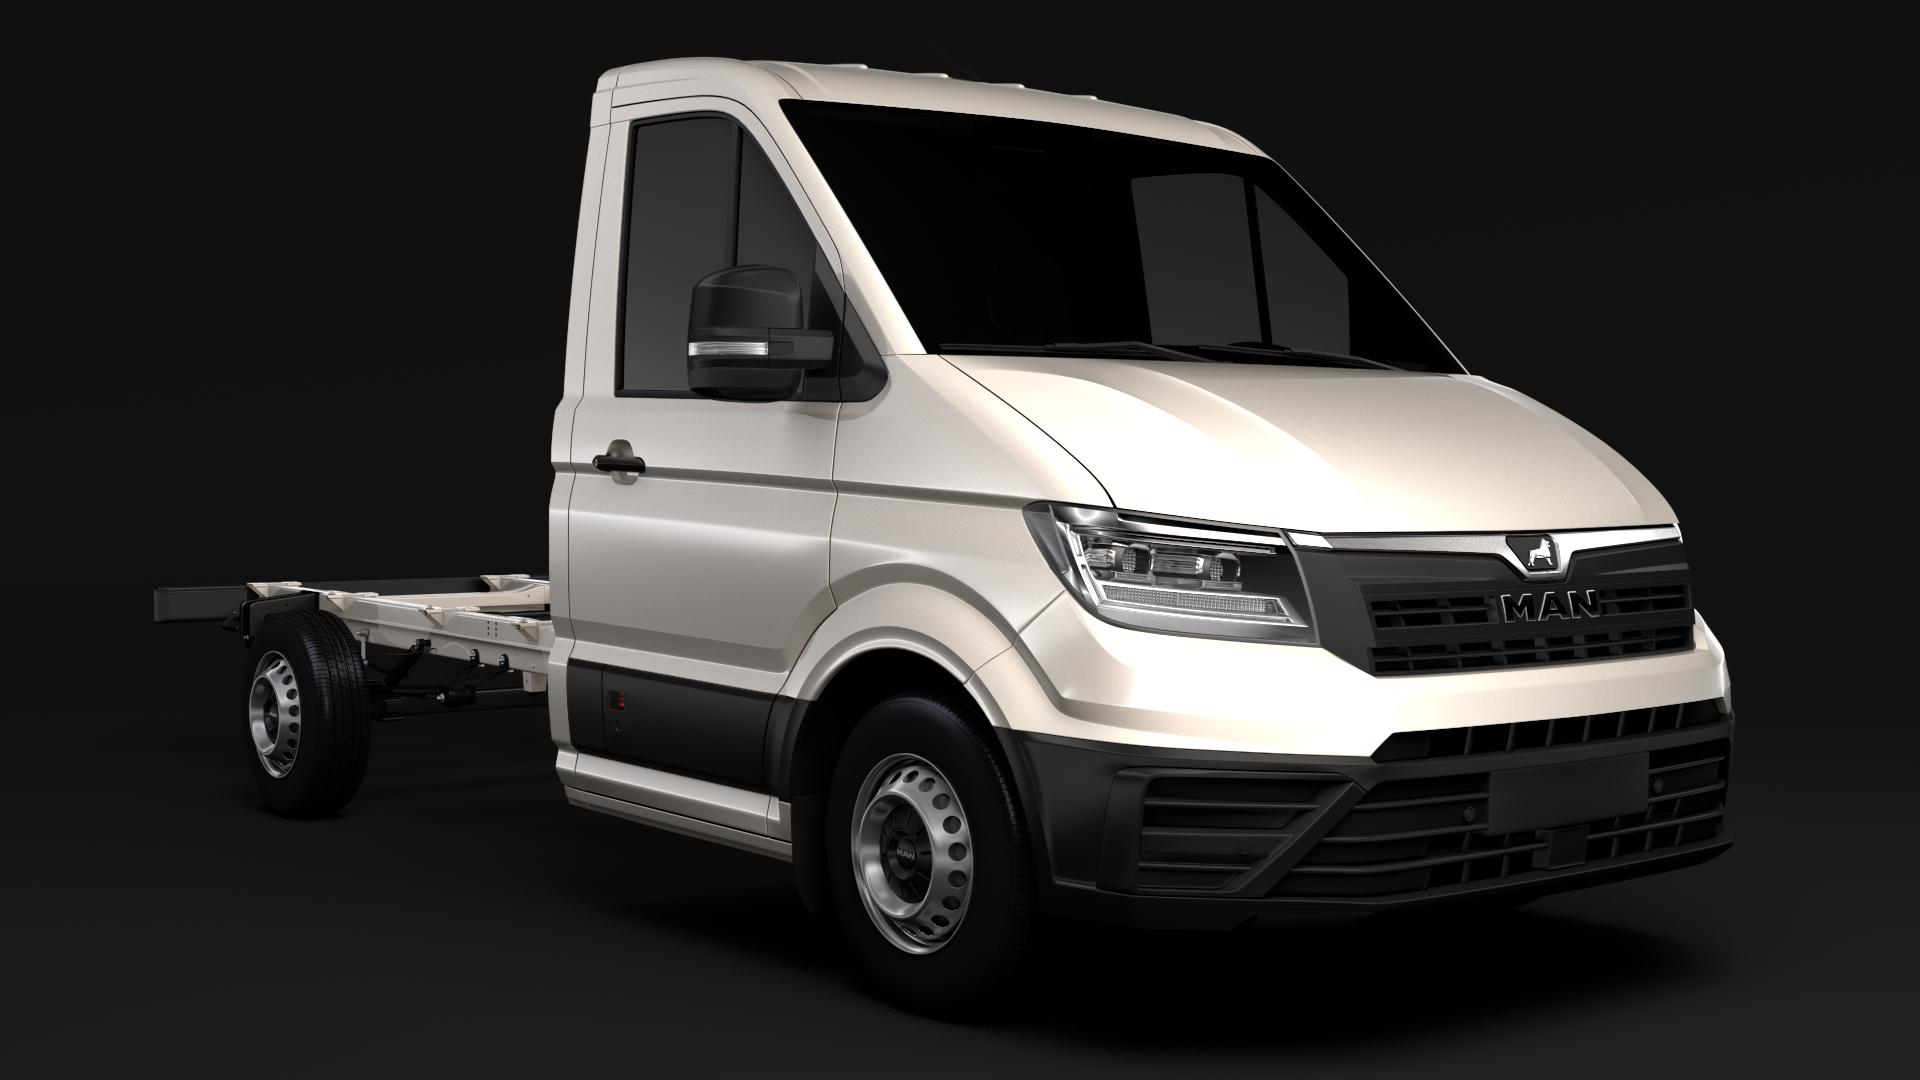 man tge chassis single-cab 2017 3d model max fbx c4d lwo ma mb hrc xsi obj 274994